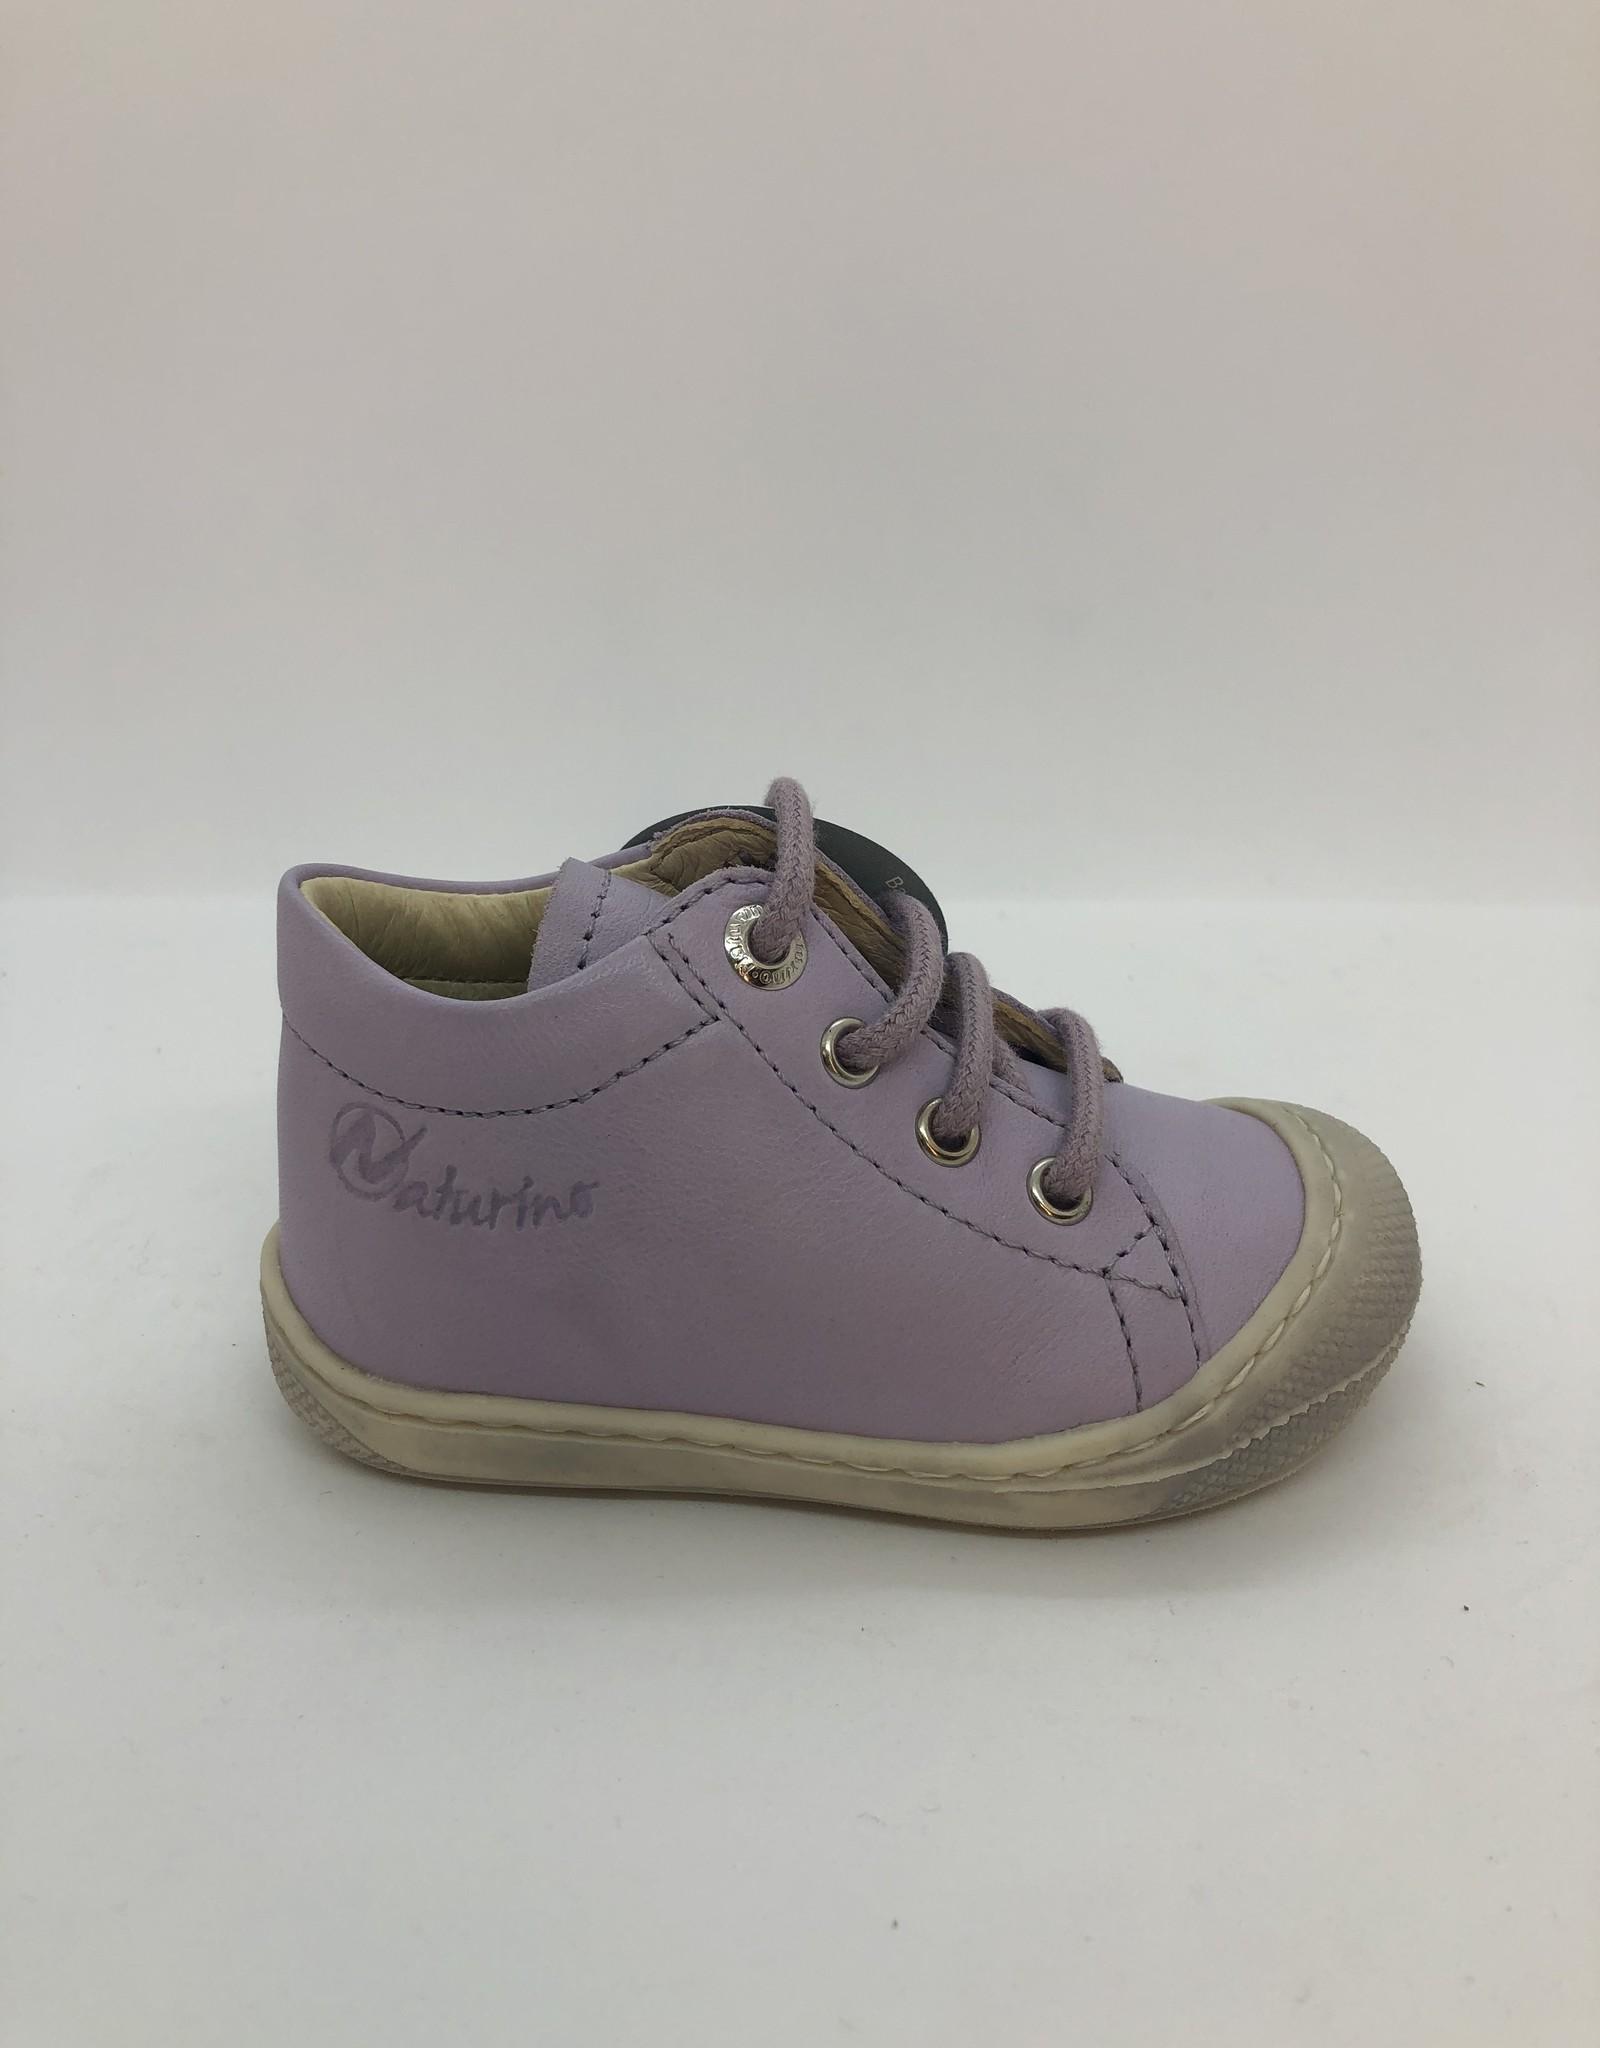 Naturino cocoon lilac